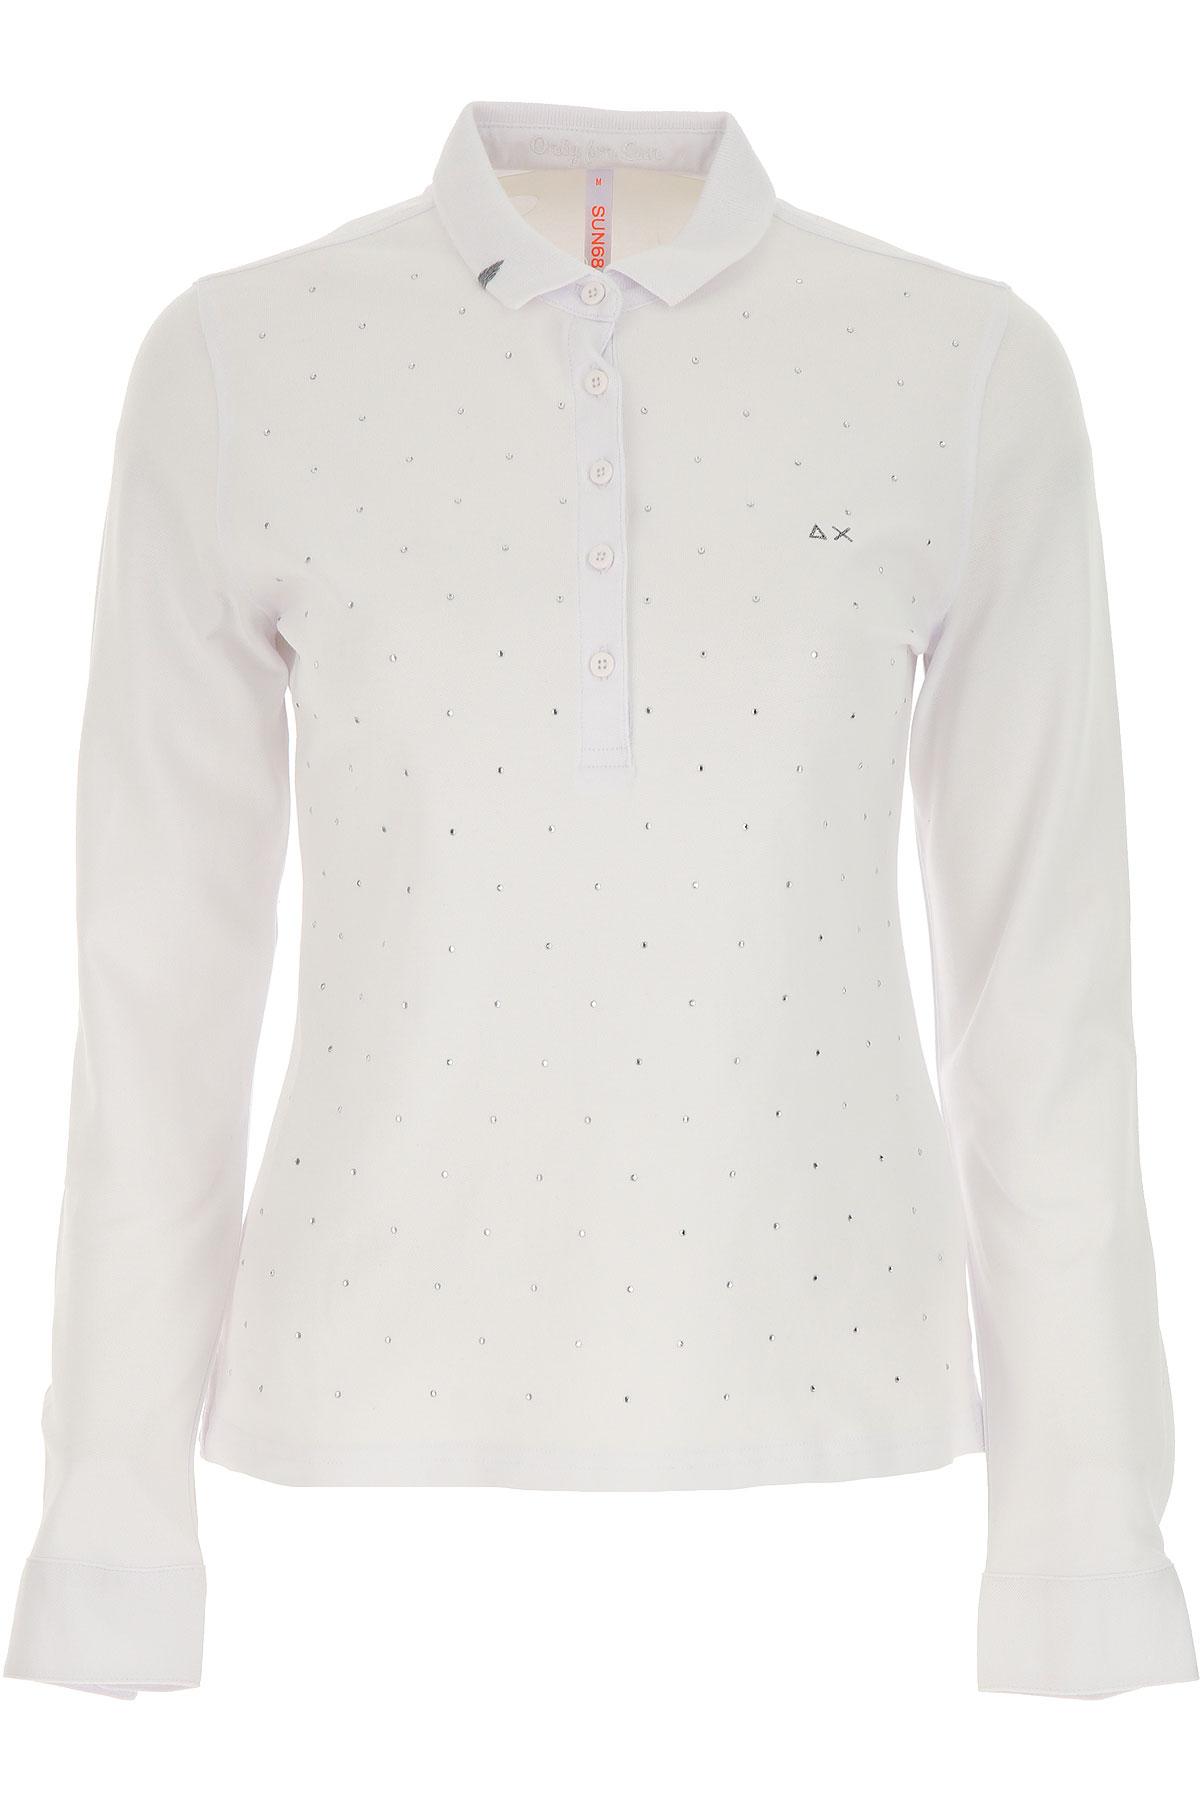 Sun68 Polo Shirt for Women On Sale, White, Cotton, 2019, 4 6 8